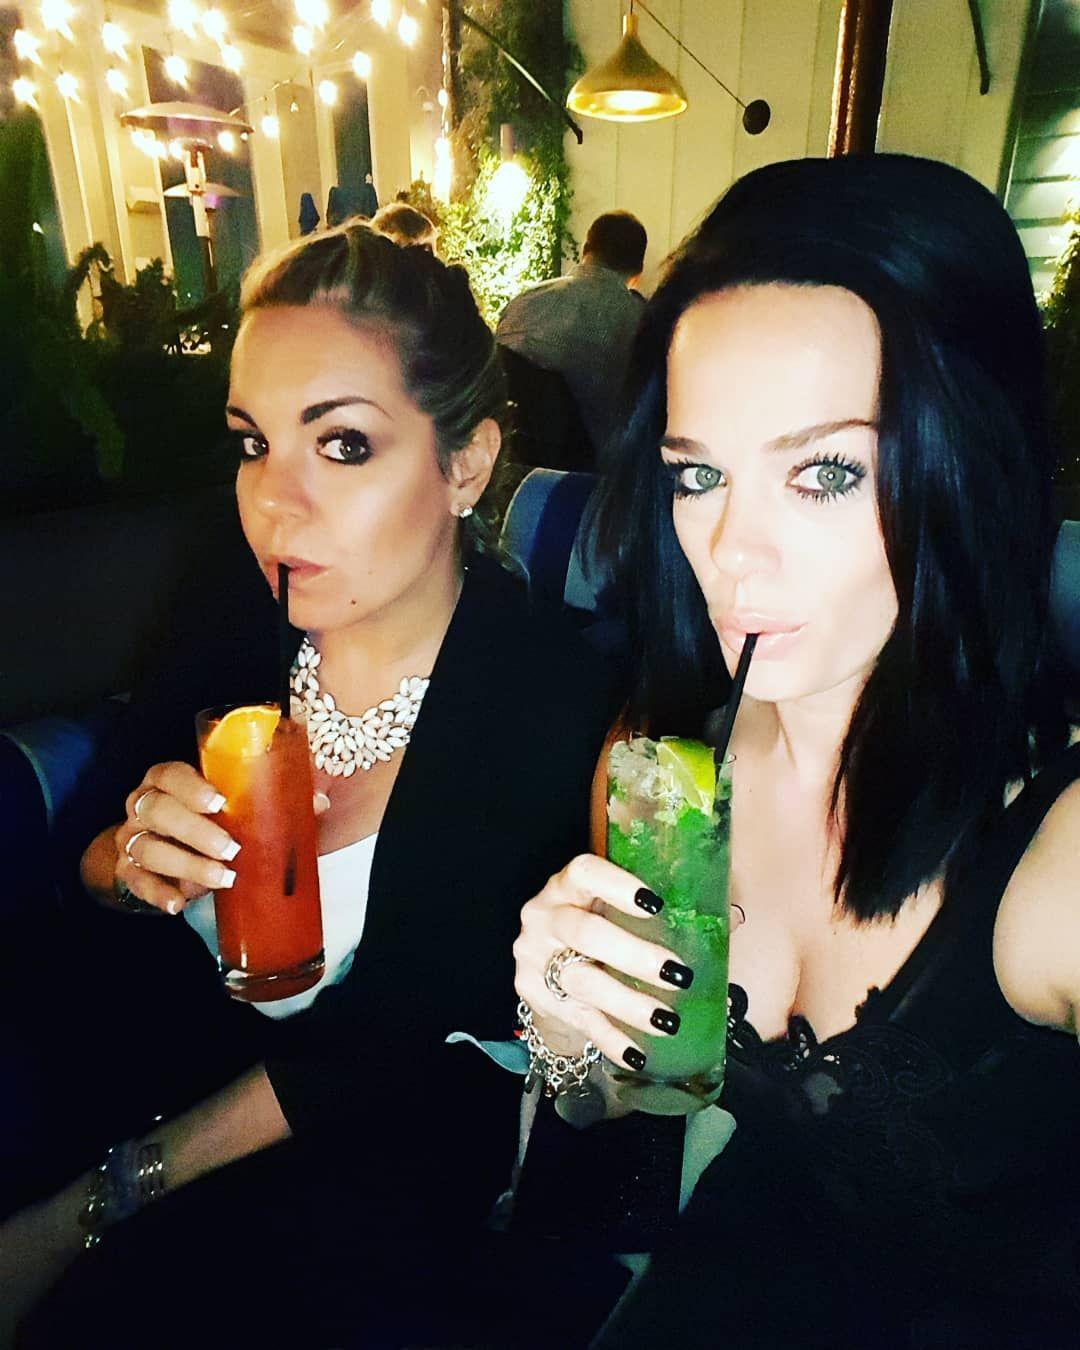 [New] The 10 Best Home Decor (with Pictures) -  #thelmaandlouise #girlphoto #yellowhair #blackhair #browneyes #blueeyes #friend #friendmigueamigo #macrofriendly #girlblogger #gitltravel #girlphoto #love #life #photooftheday